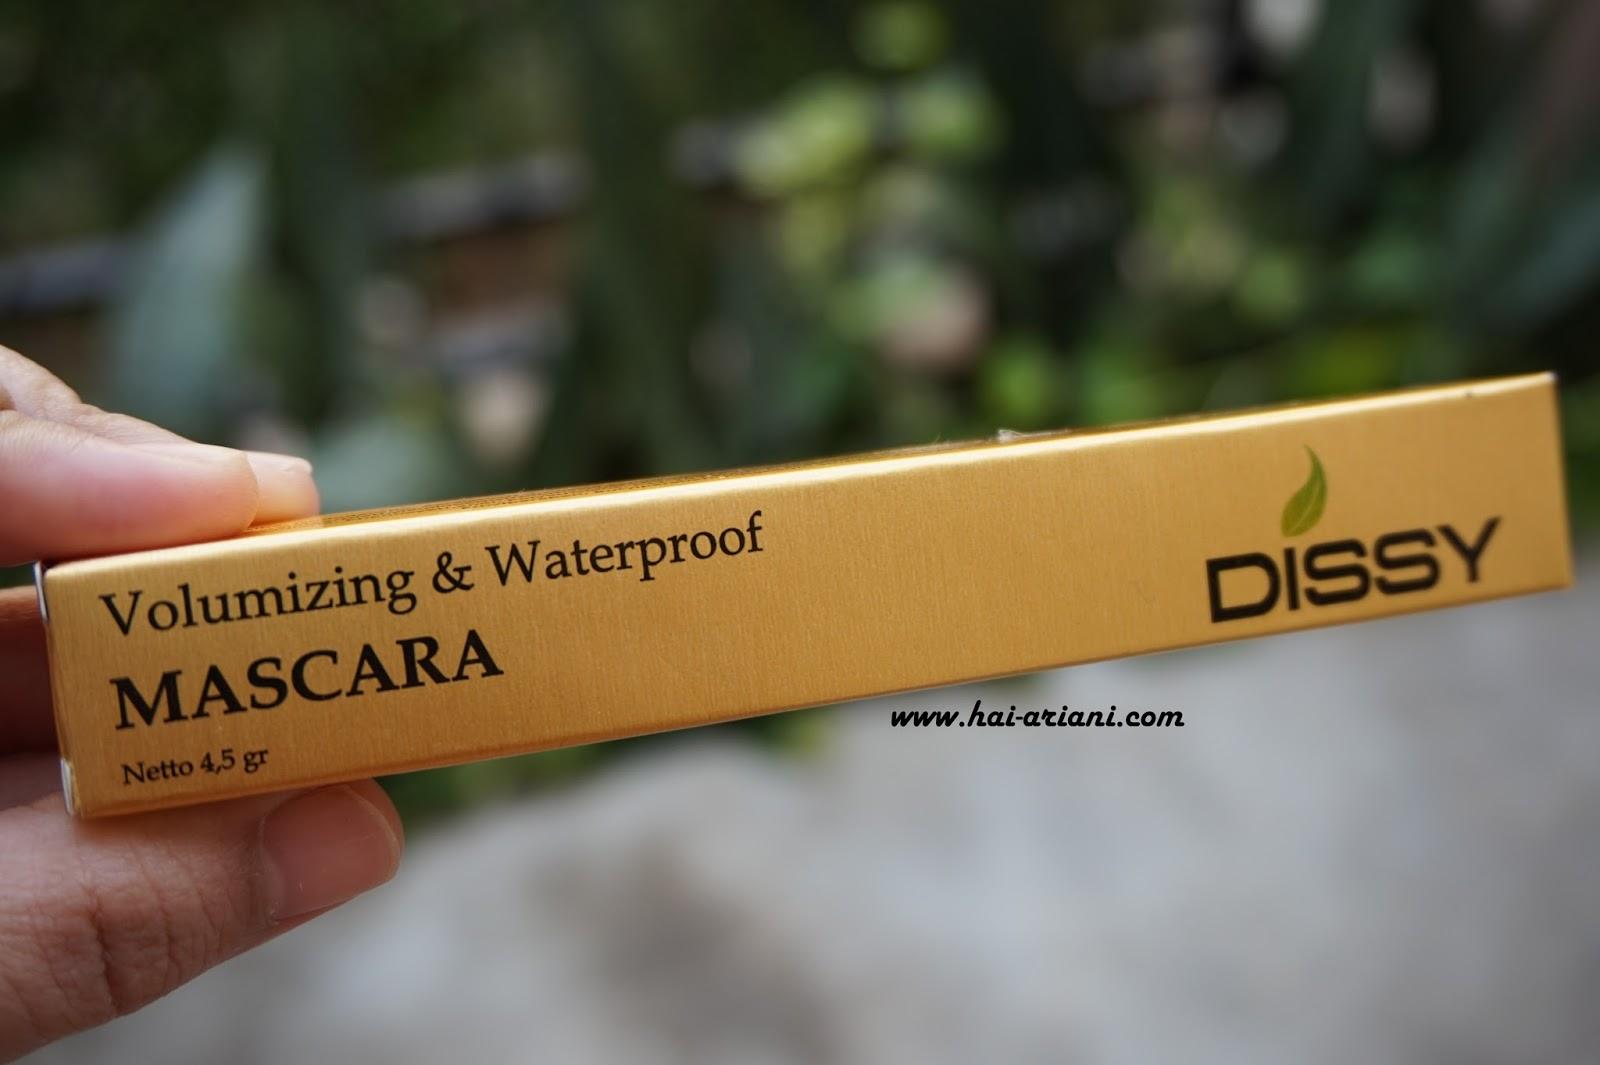 VOLUMIZING AND WATERPROOF MASCARA DISSY REVIEW